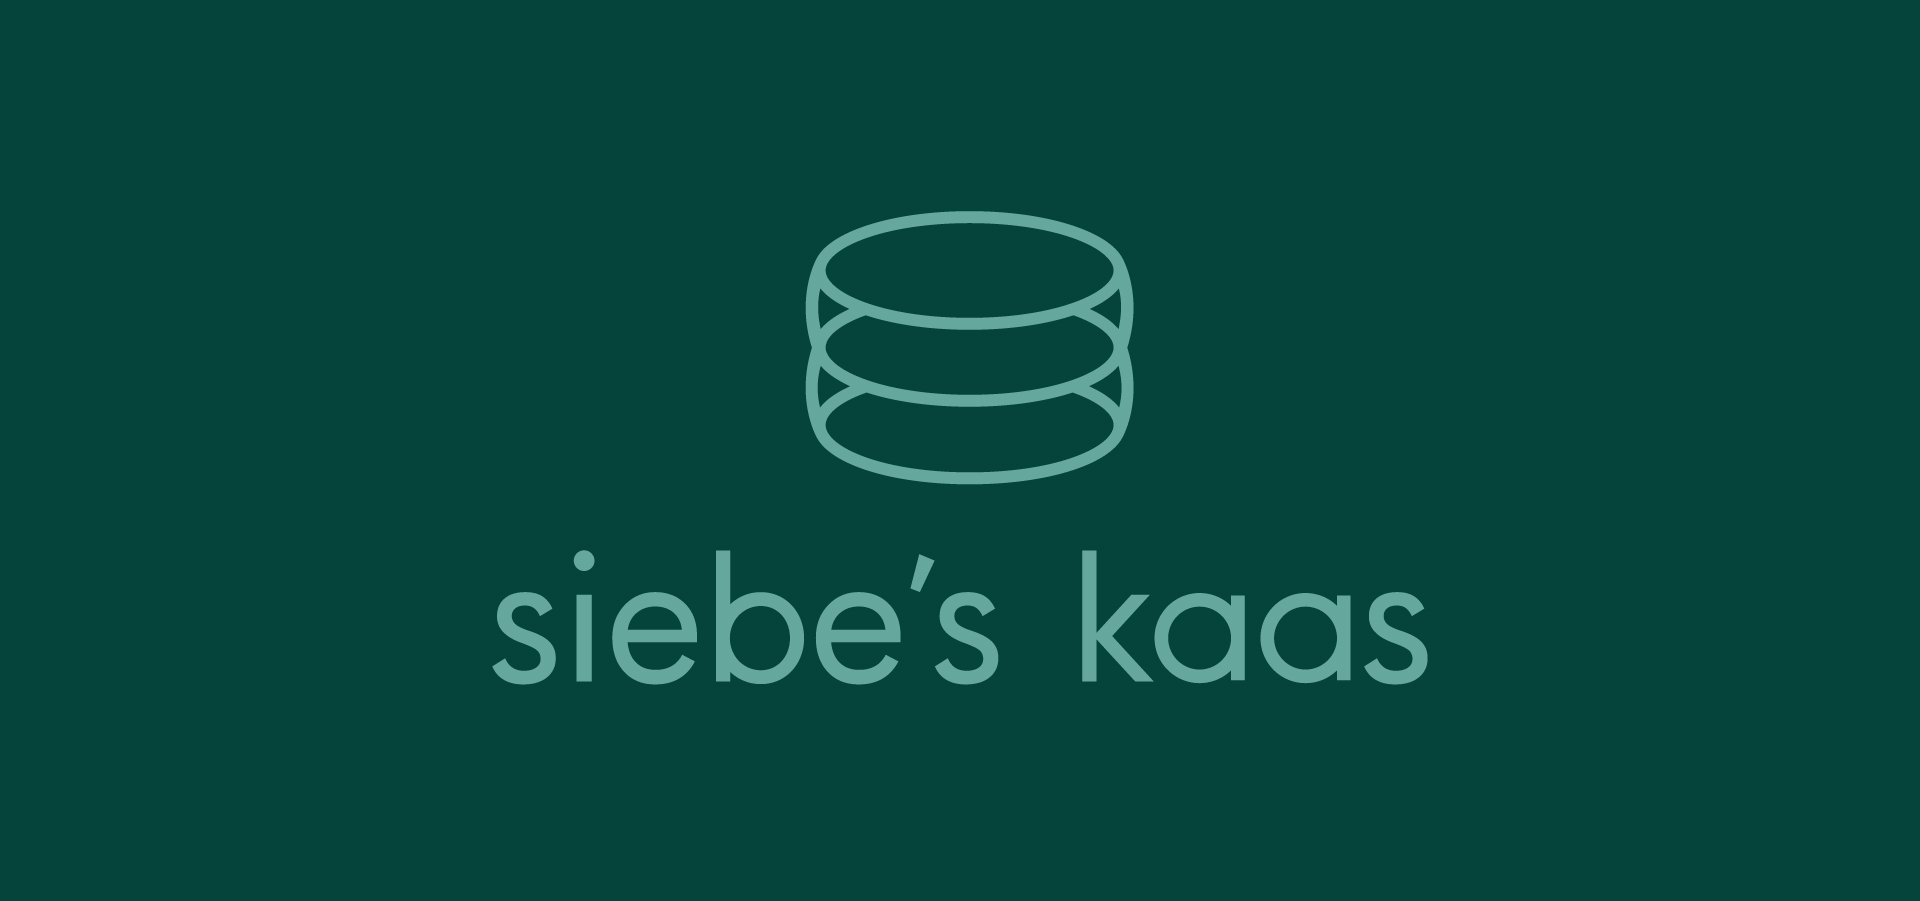 Siebe's Kaas